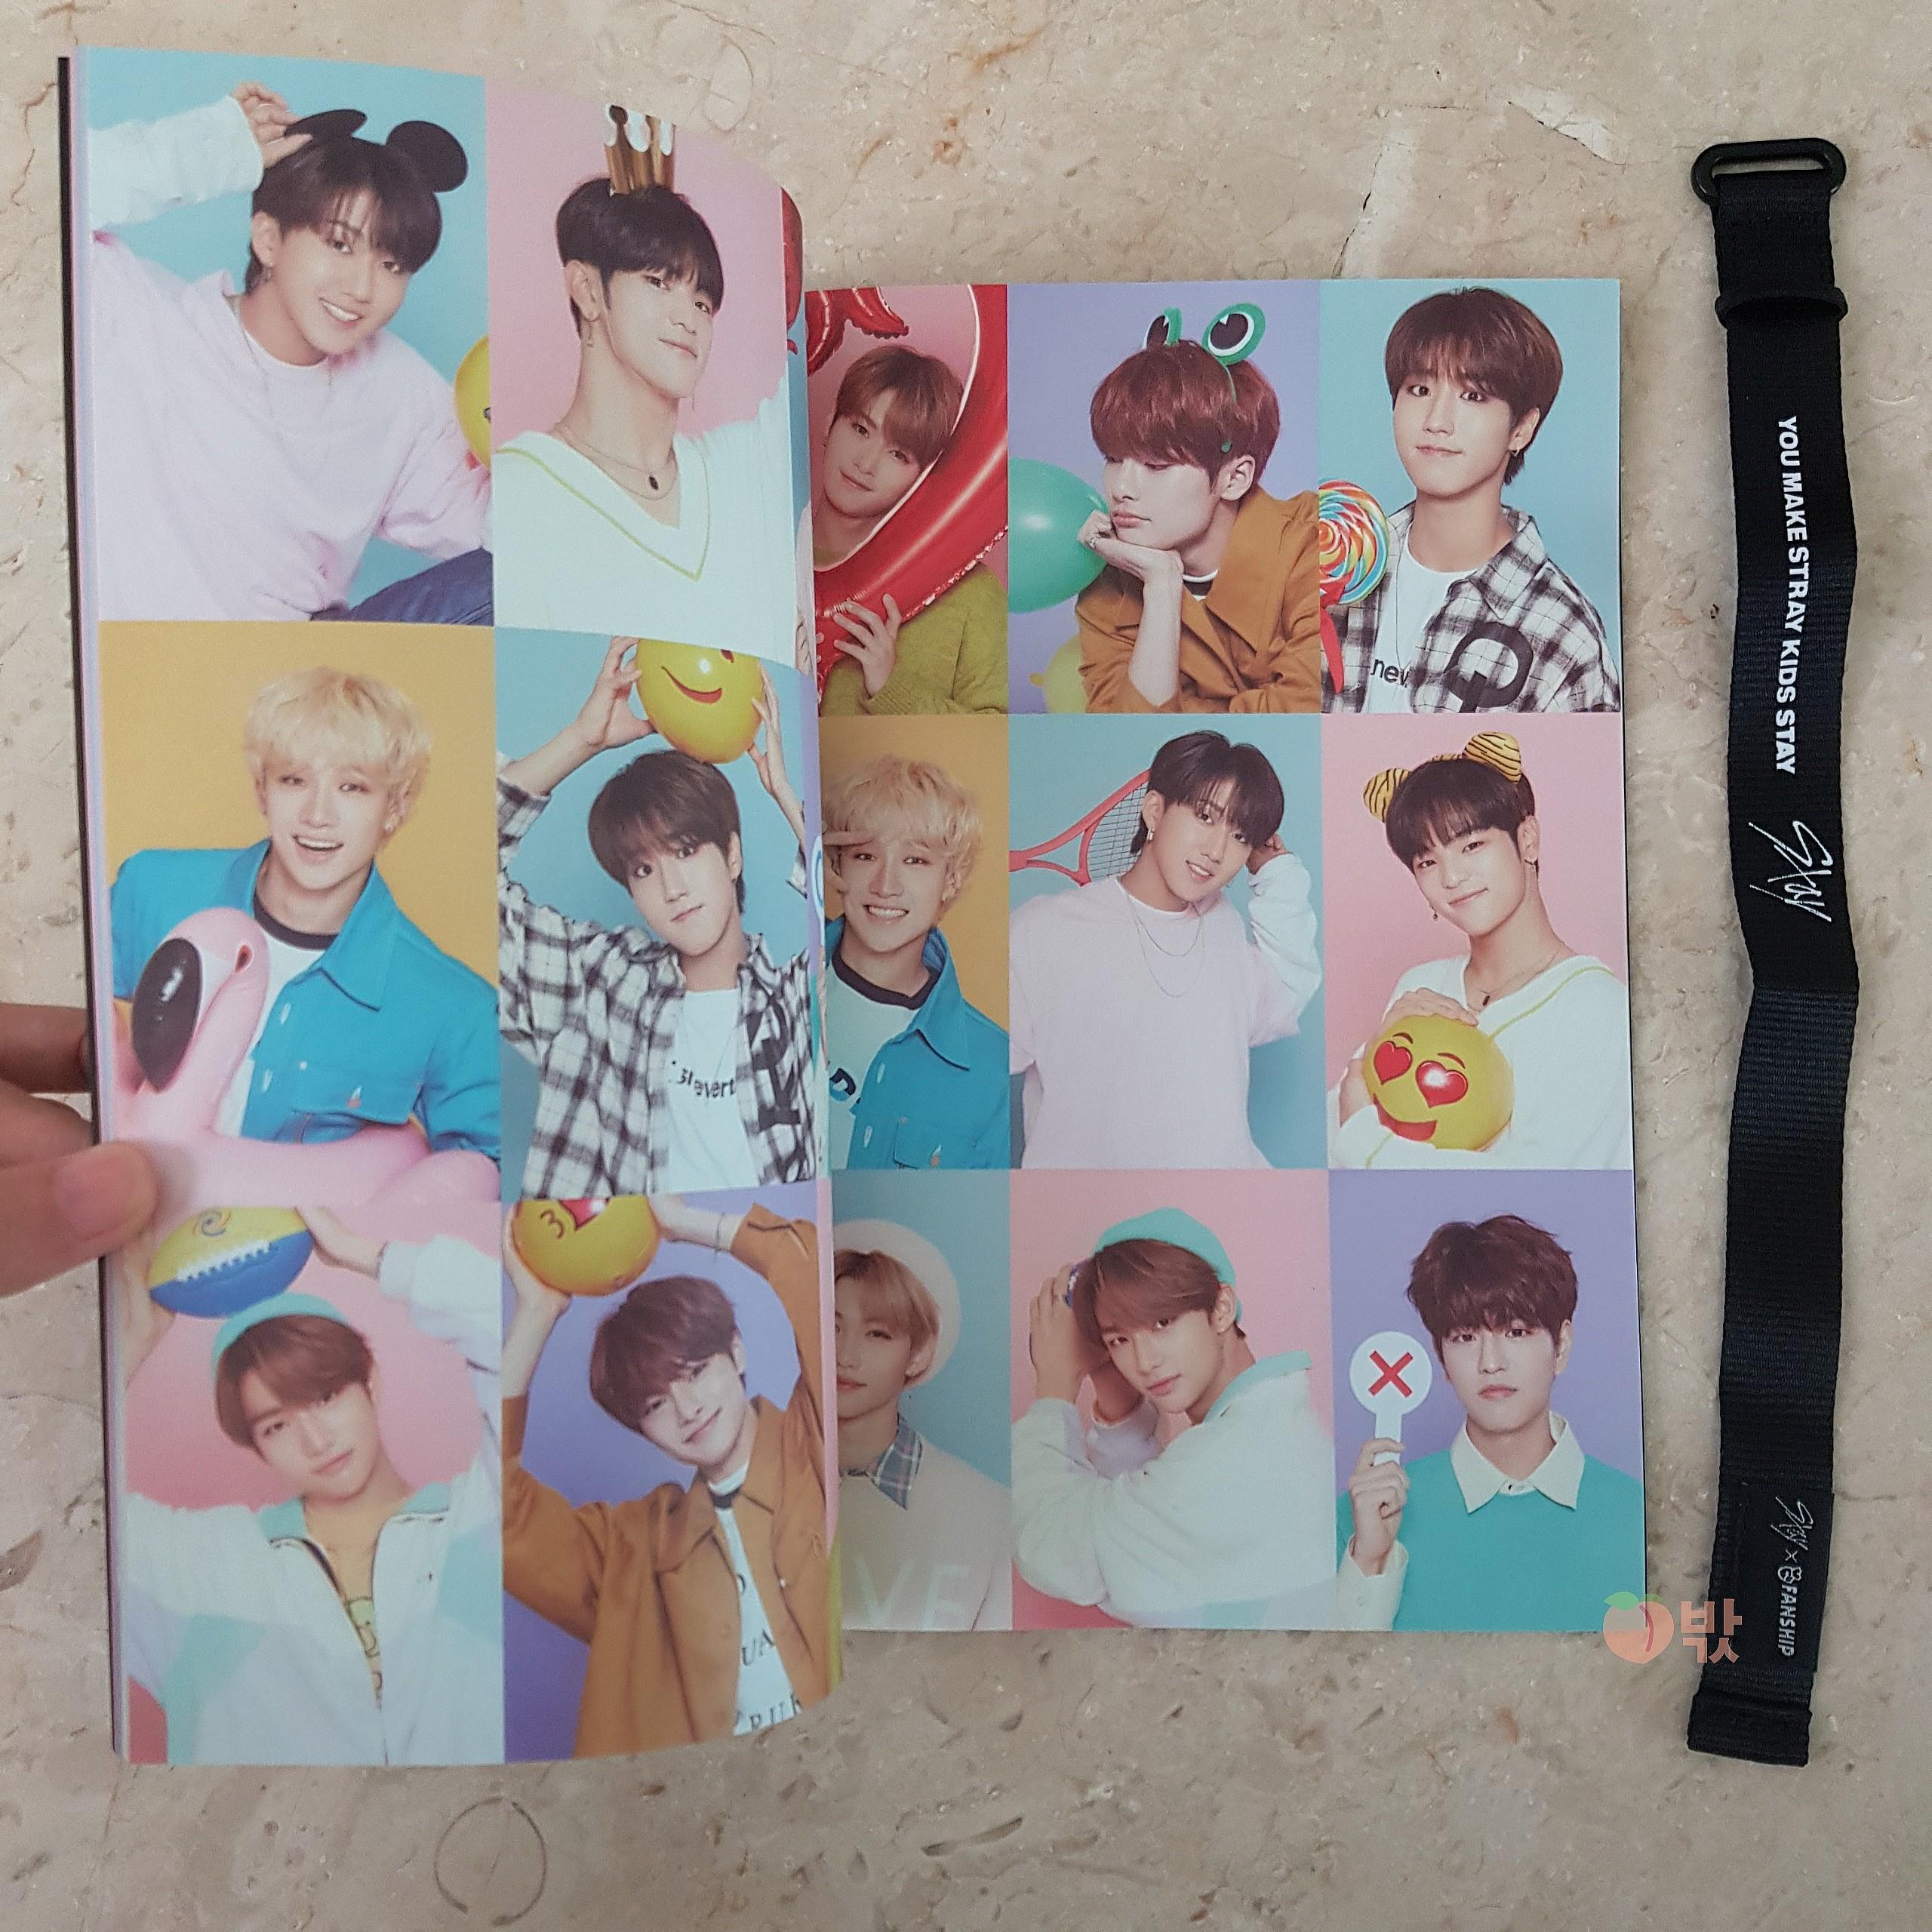 [Ready Stock] Stray Kids Stay Fanship Kit (Photobook + Hand Strap)